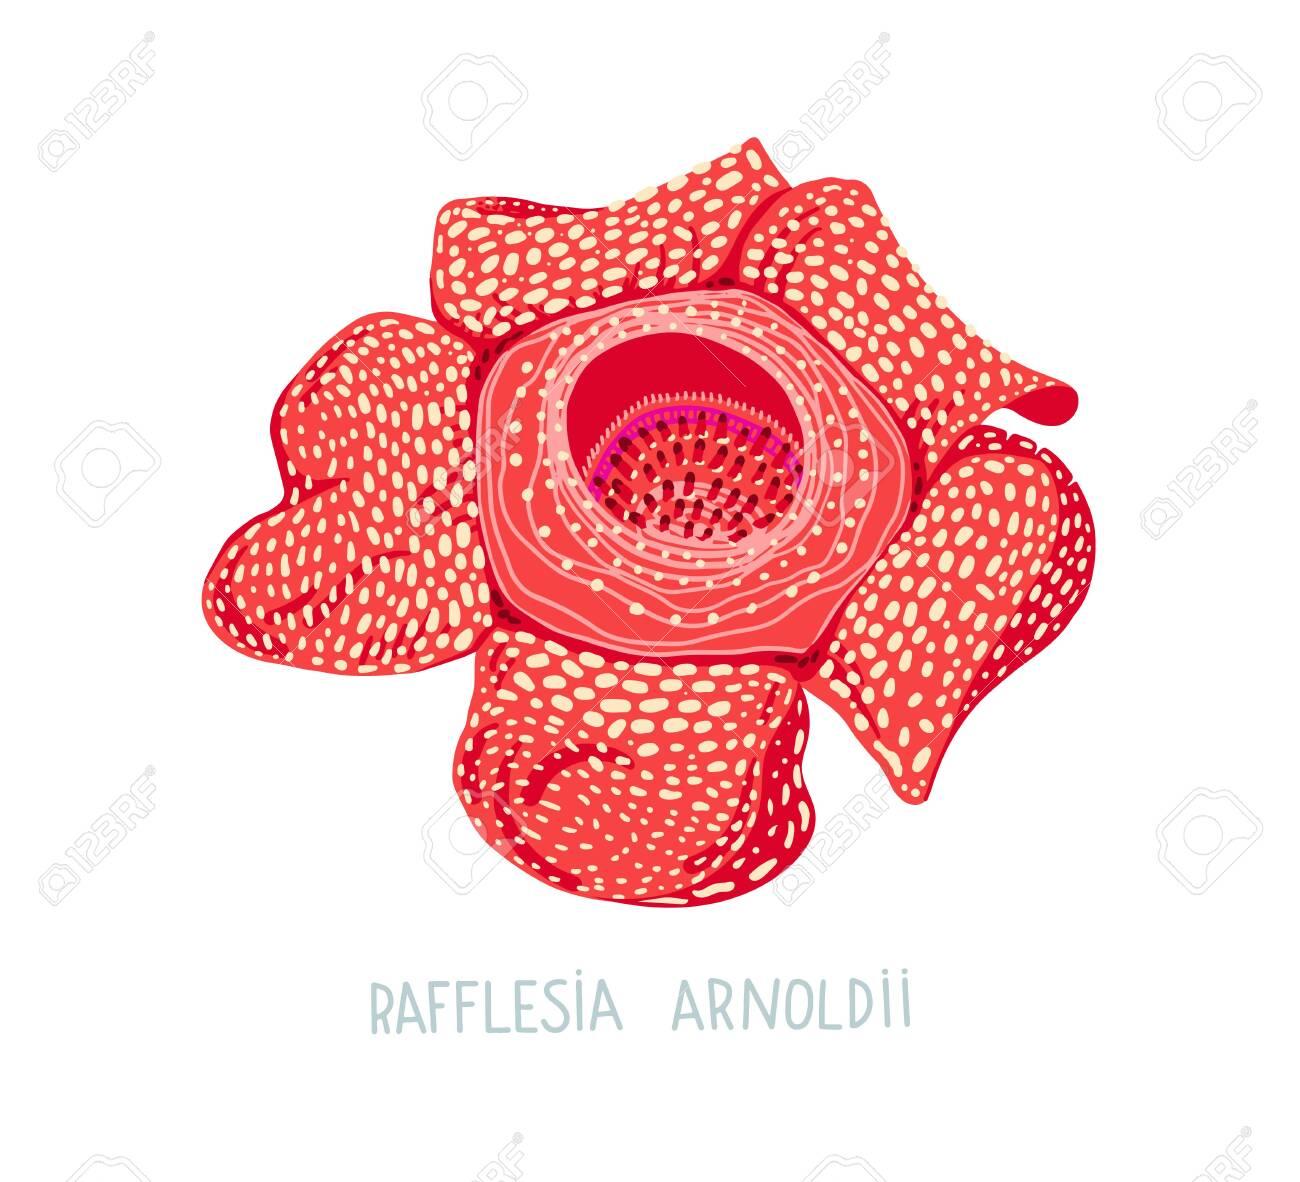 Free Rafflesia flower Vector Image - 1237936   StockUnlimited